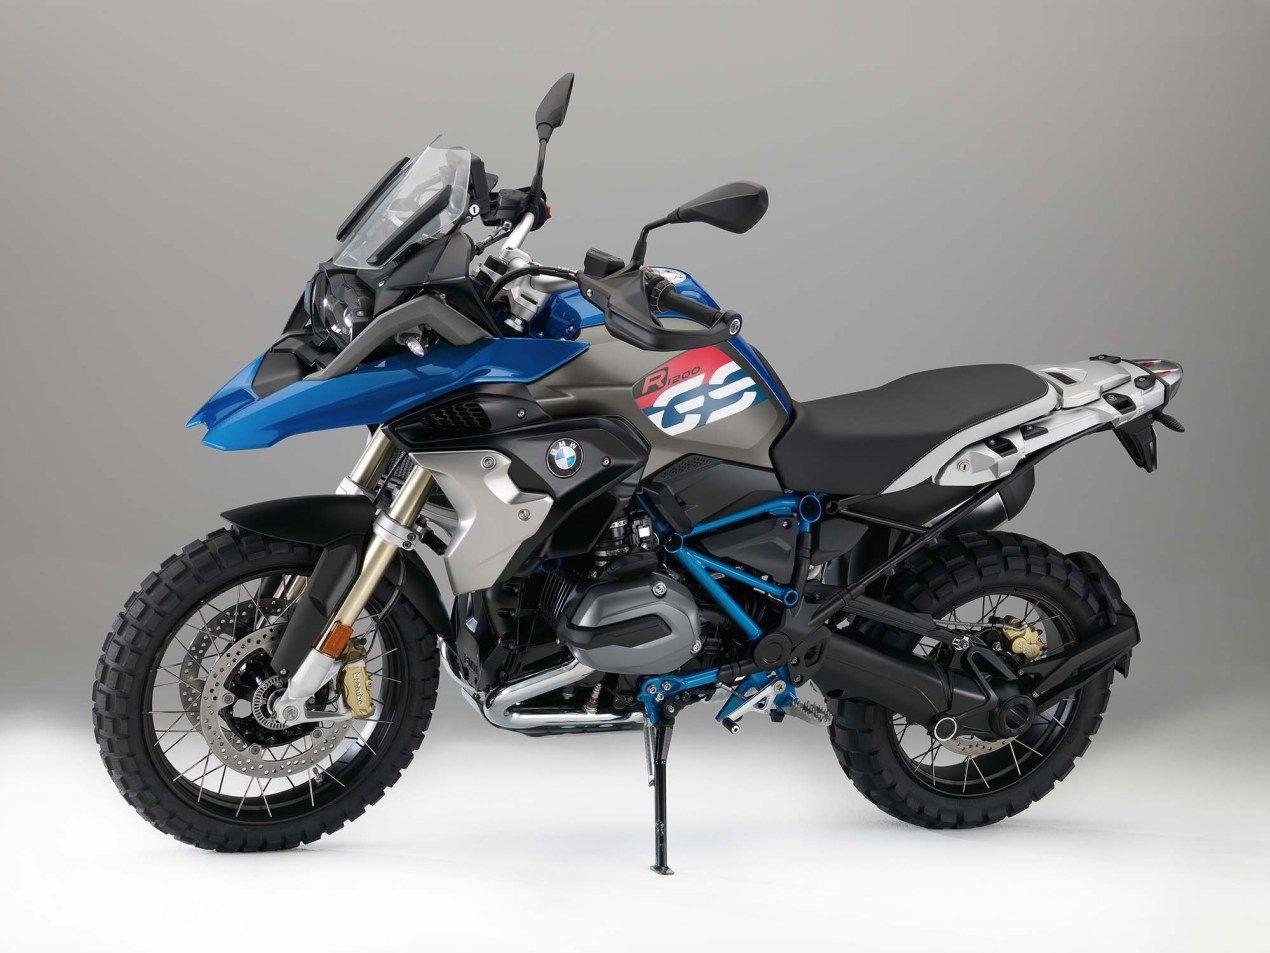 2017 Bmw R1200gs Gets Upgrades And A Little Rallye In 2020 2017 Bmw Bmw Motorbikes Bike Bmw